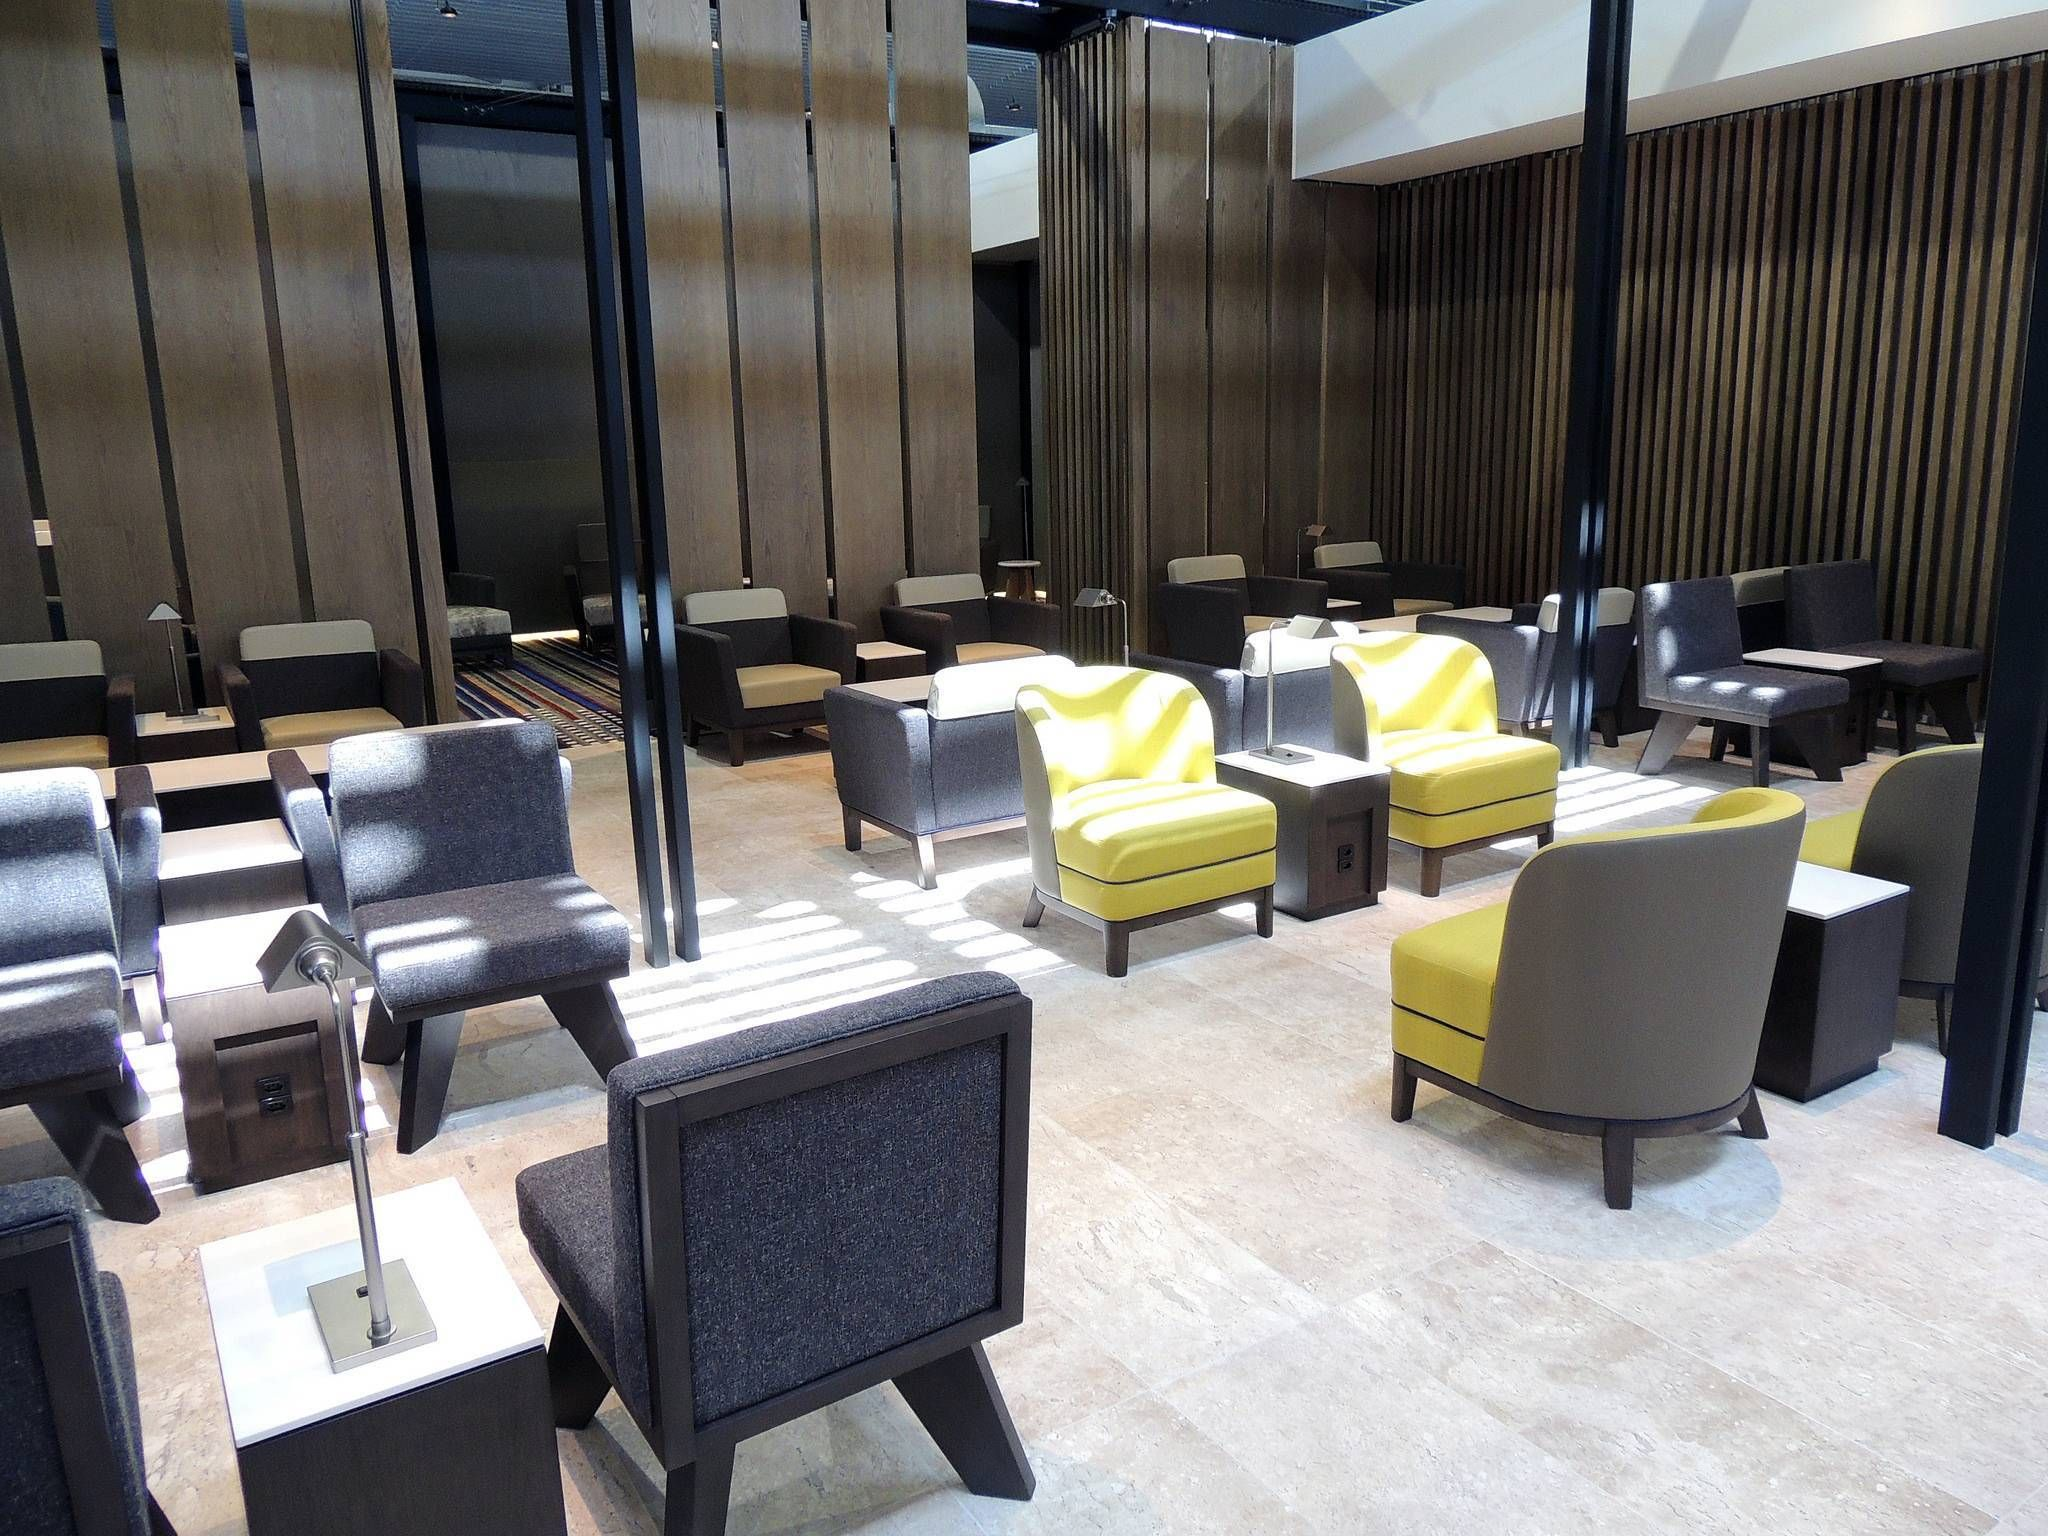 tam vip lounge gru passageirodeprimeira sala vip